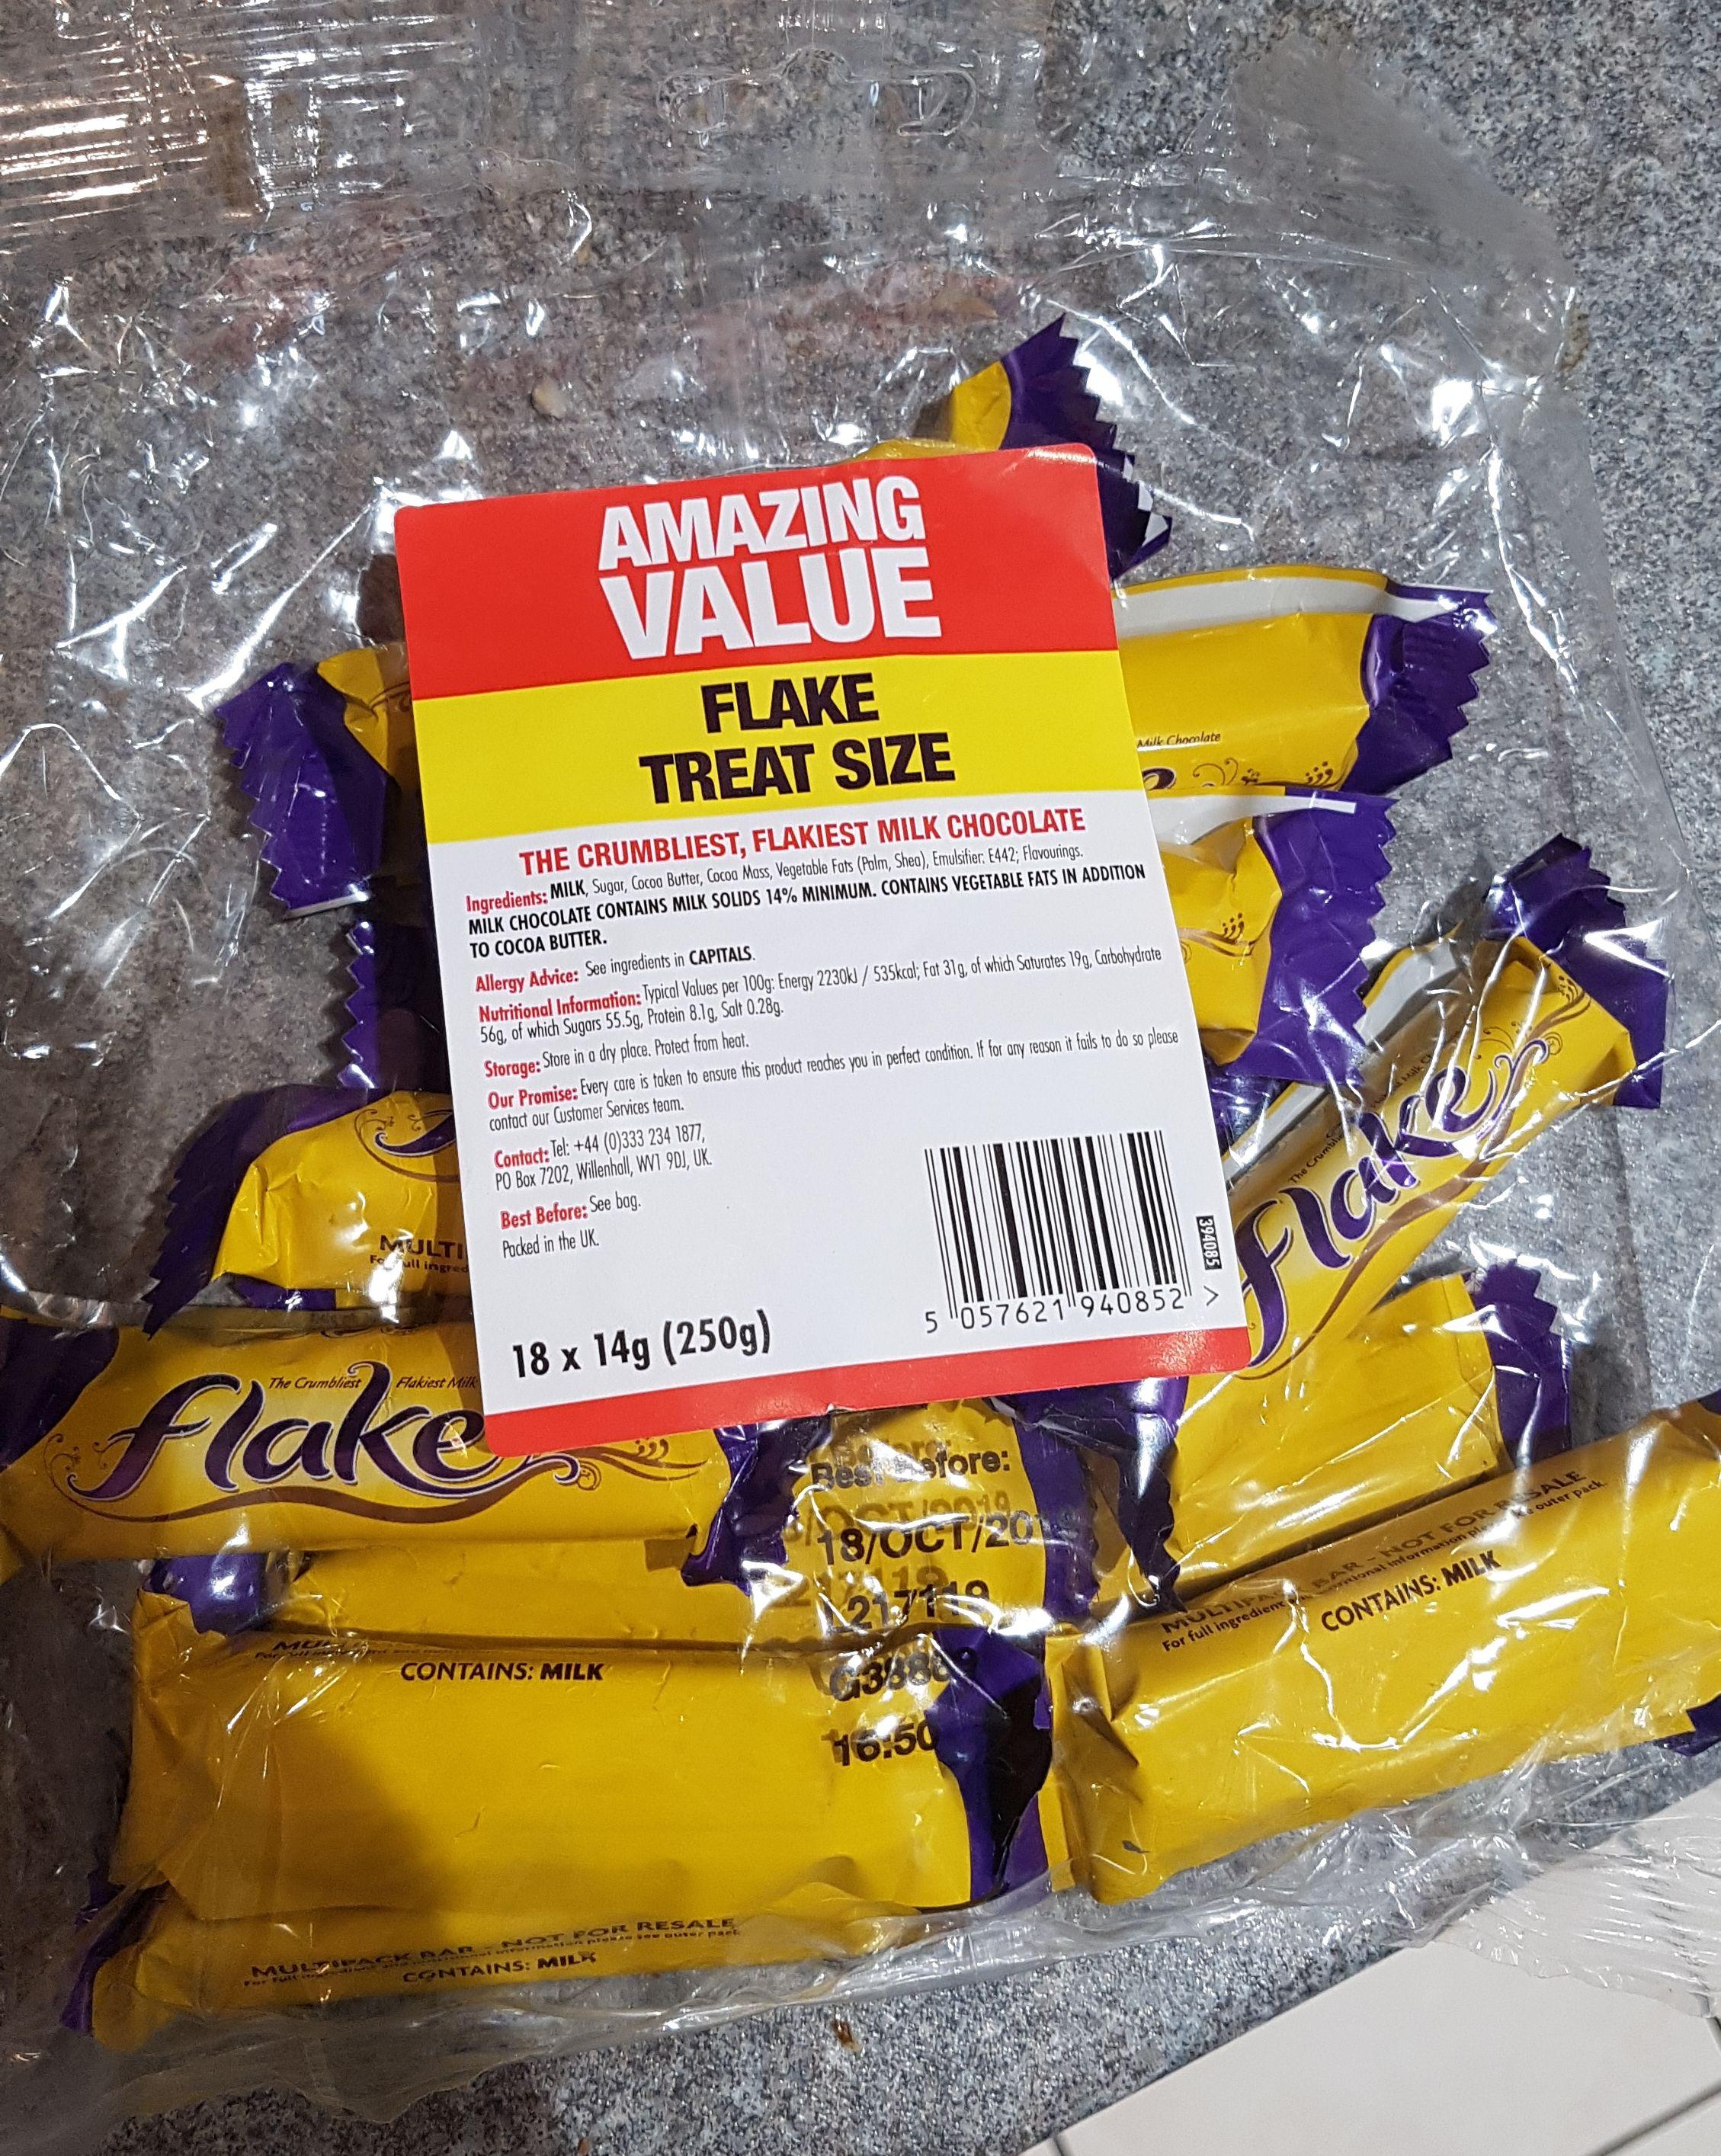 Cadbury's Flake Bag of 18 x 14g bars (250g) £1 in Poundland